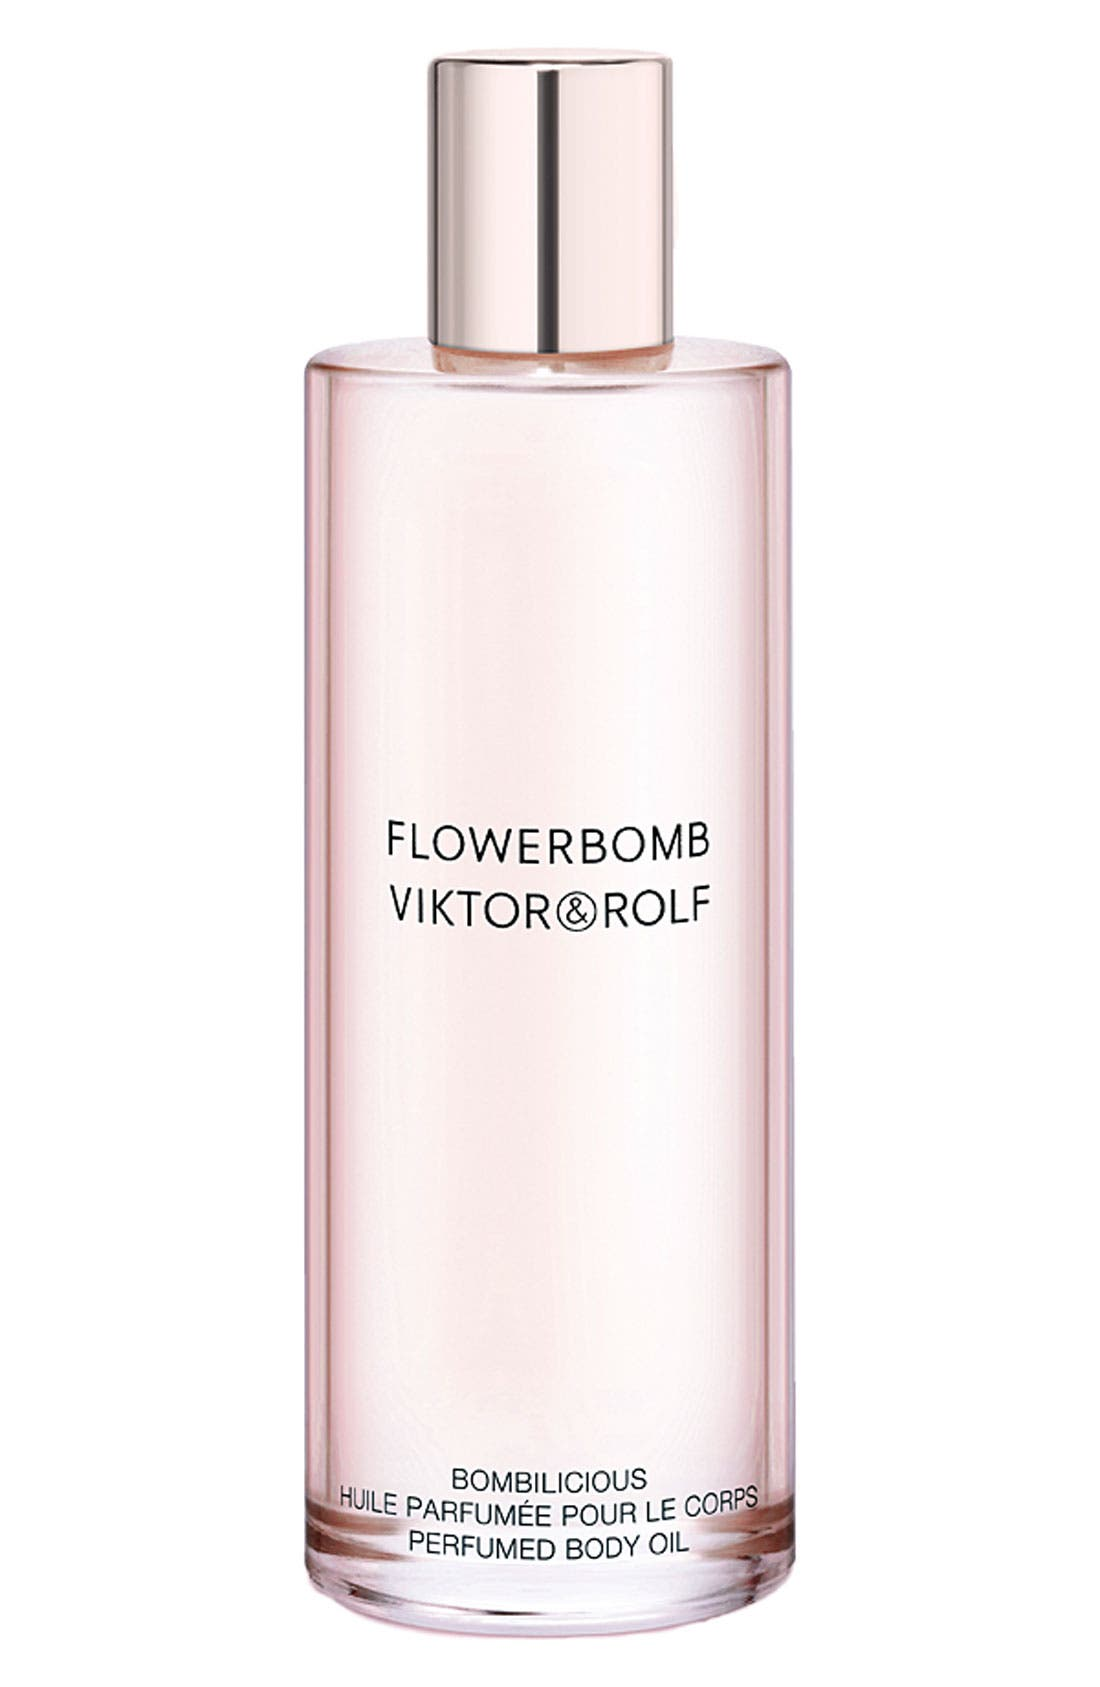 VIKTOR&ROLF, 'Flowerbomb' Bomblicious Perfumed Body Oil, Main thumbnail 1, color, 000